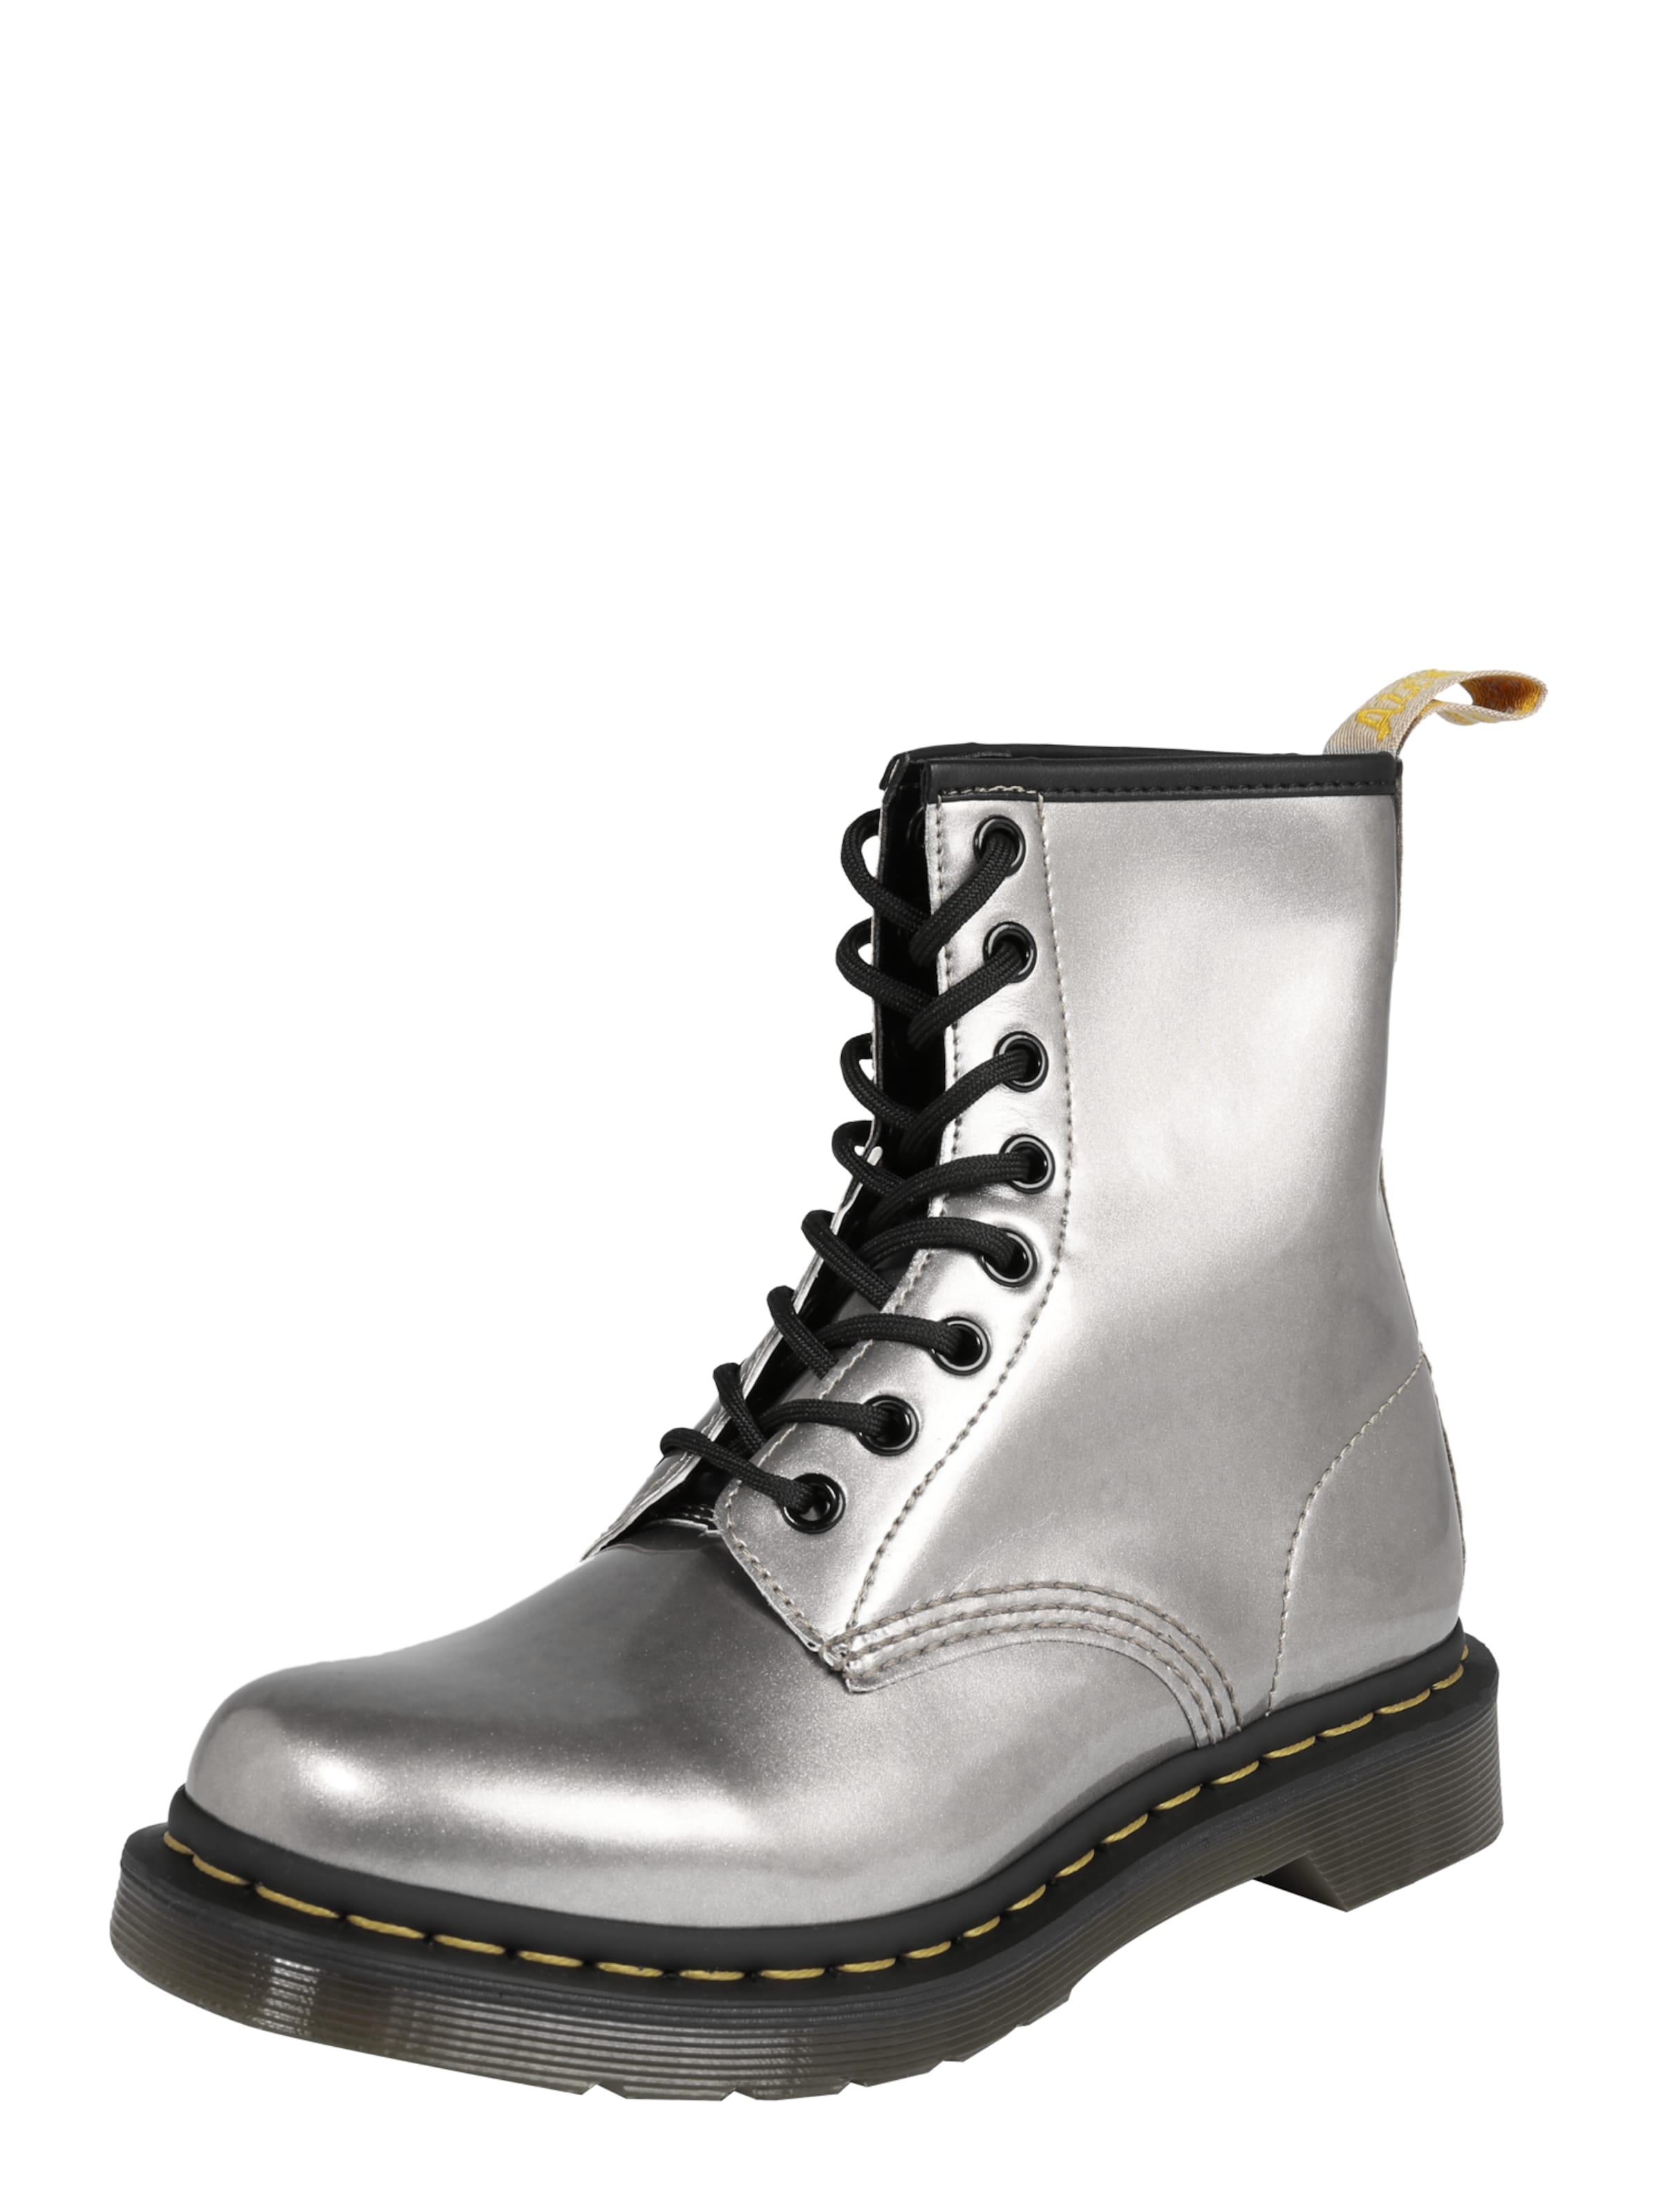 In Silber DrMartens Eye Boot 1460 Vegan' '8 Stiefel xCWBorde